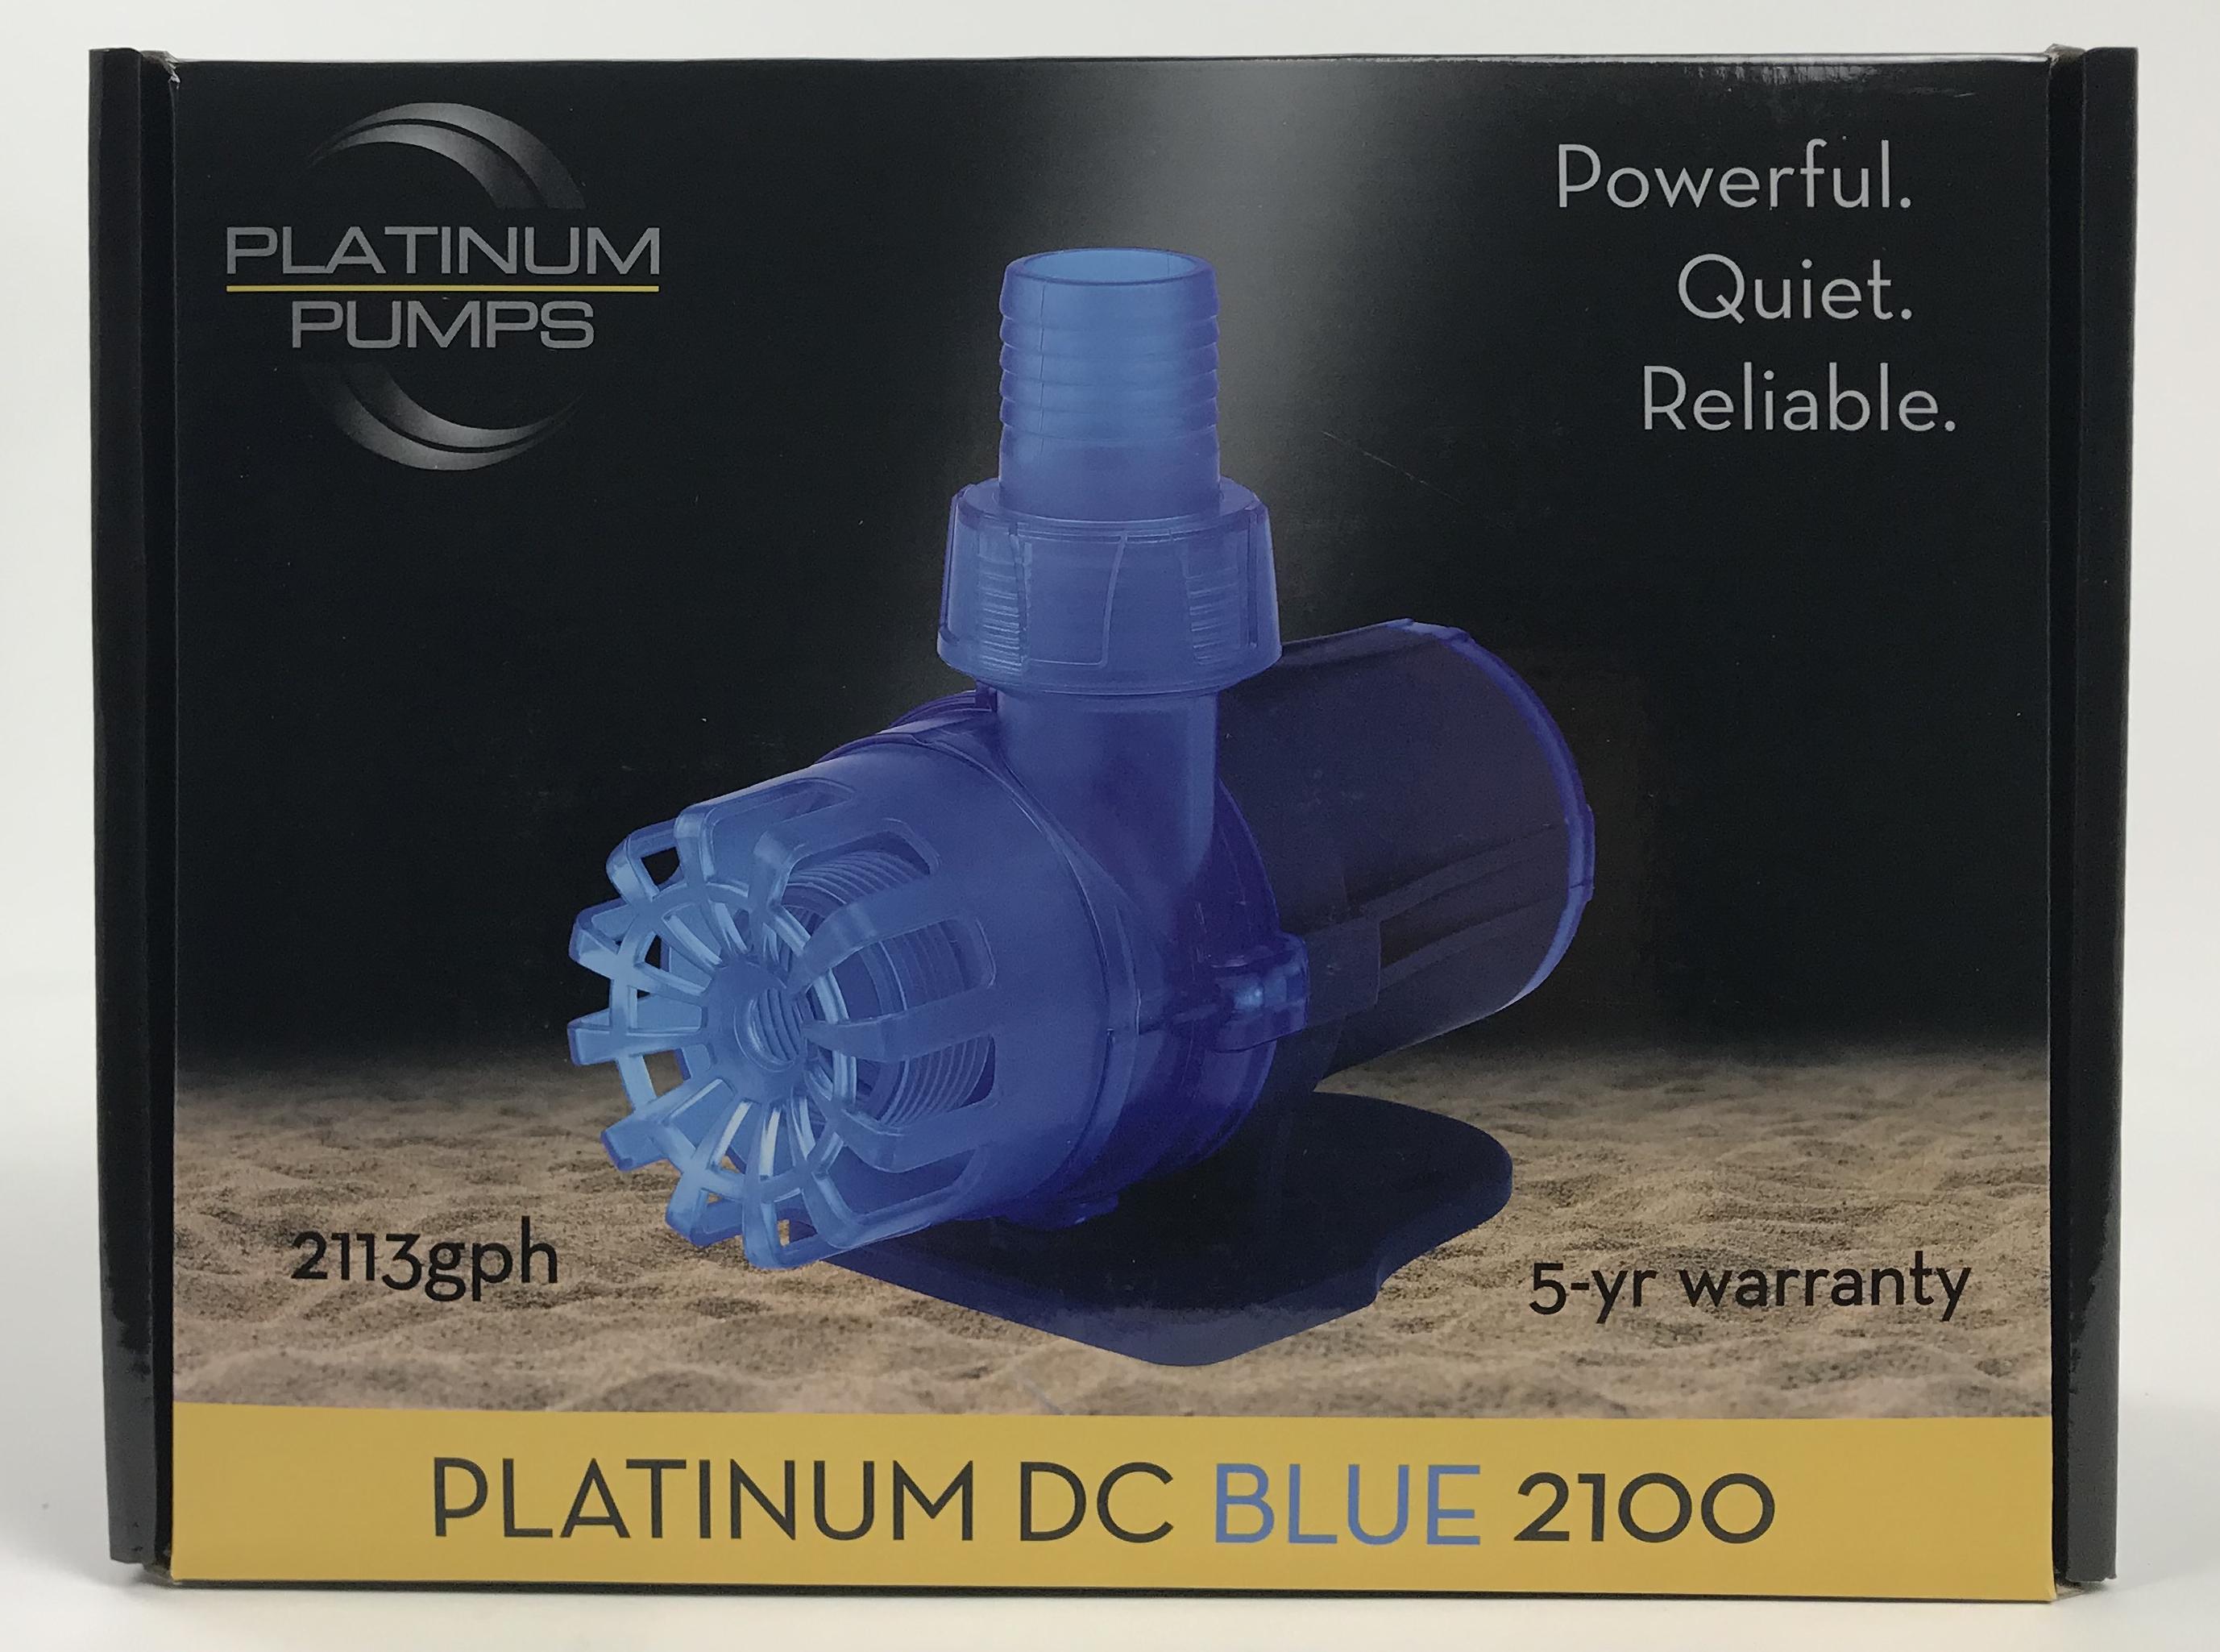 Platinum DC Blue 2100 Pump - 2113 gph